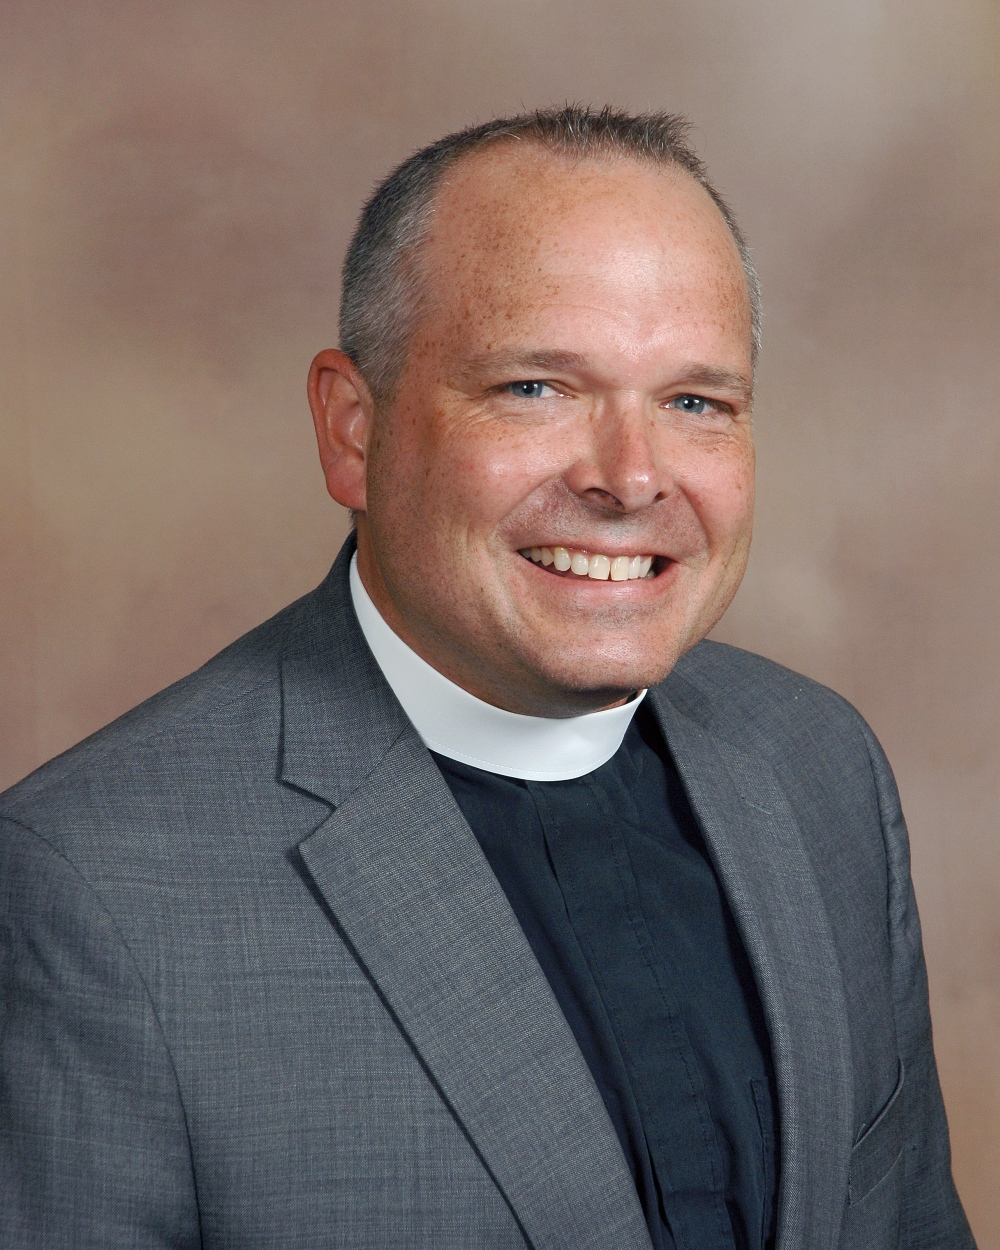 Dean, West Central Conference The Rev. Greg Busboom  St. John's, Springfield